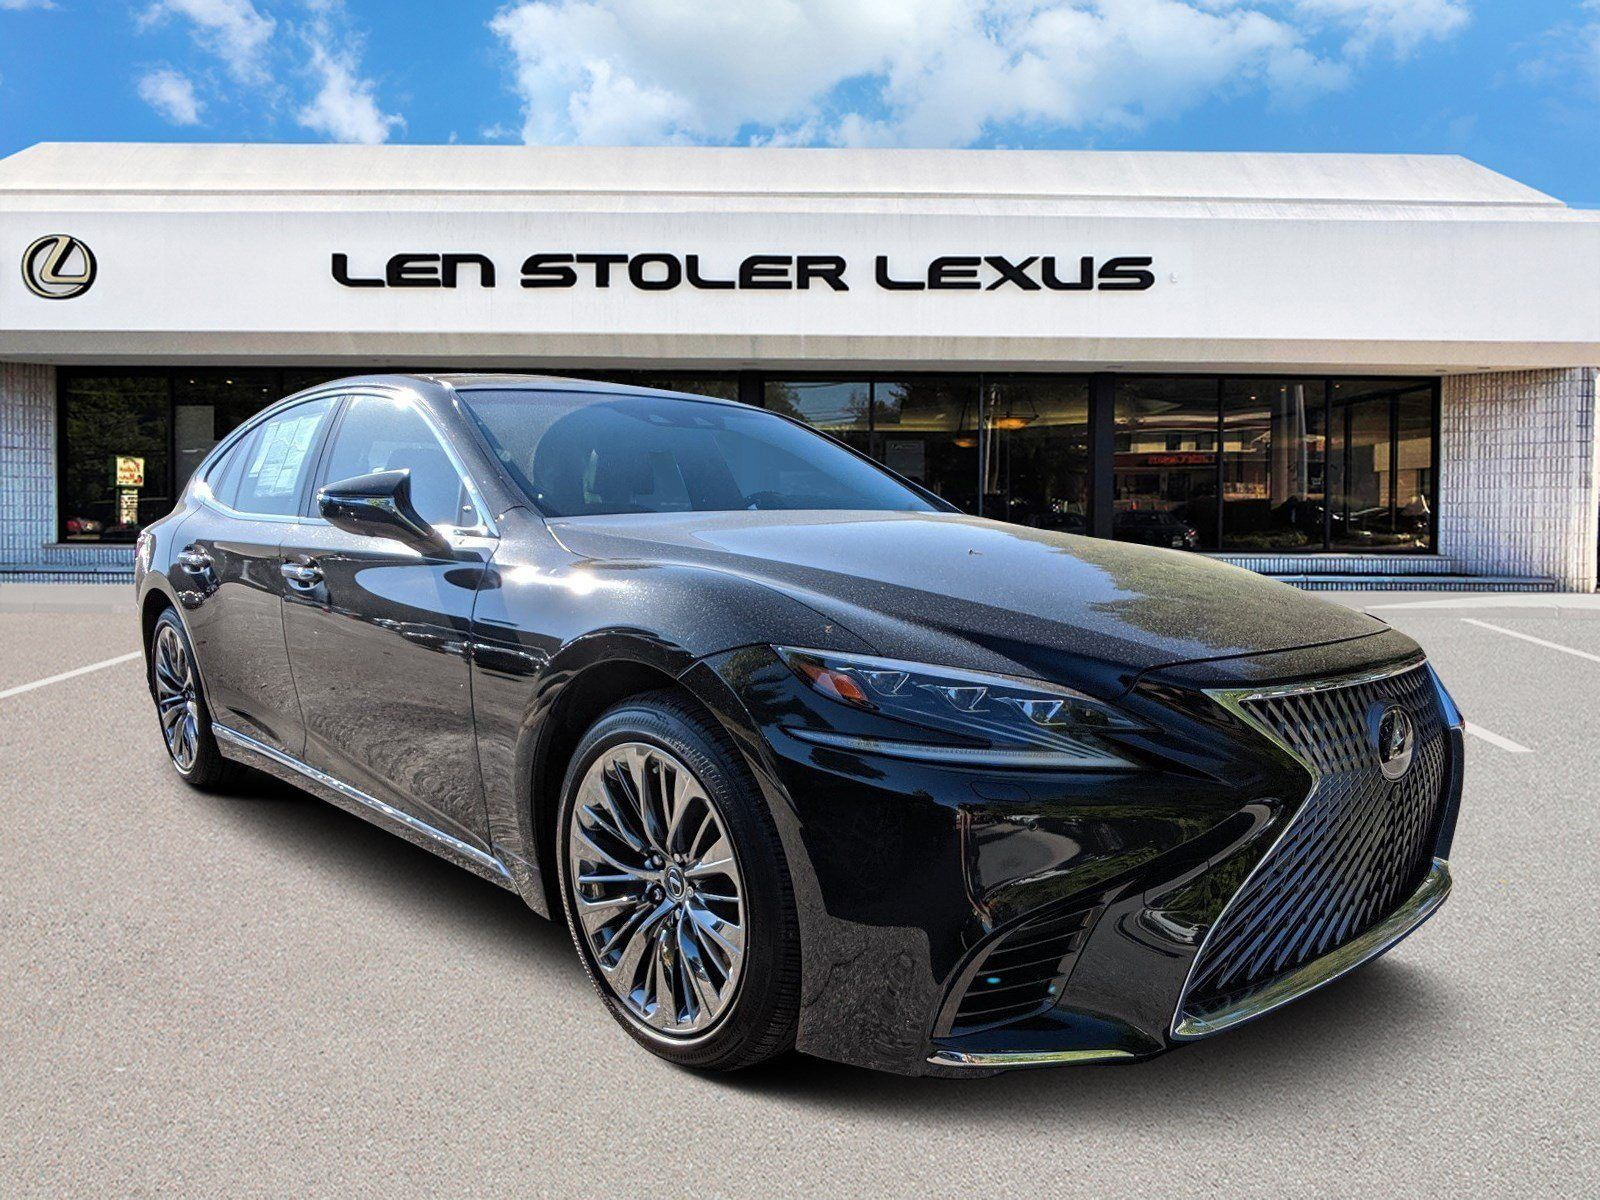 2021 Lexus Ls 460 Images Lexus Ls 460 Lexus Ls Lexus